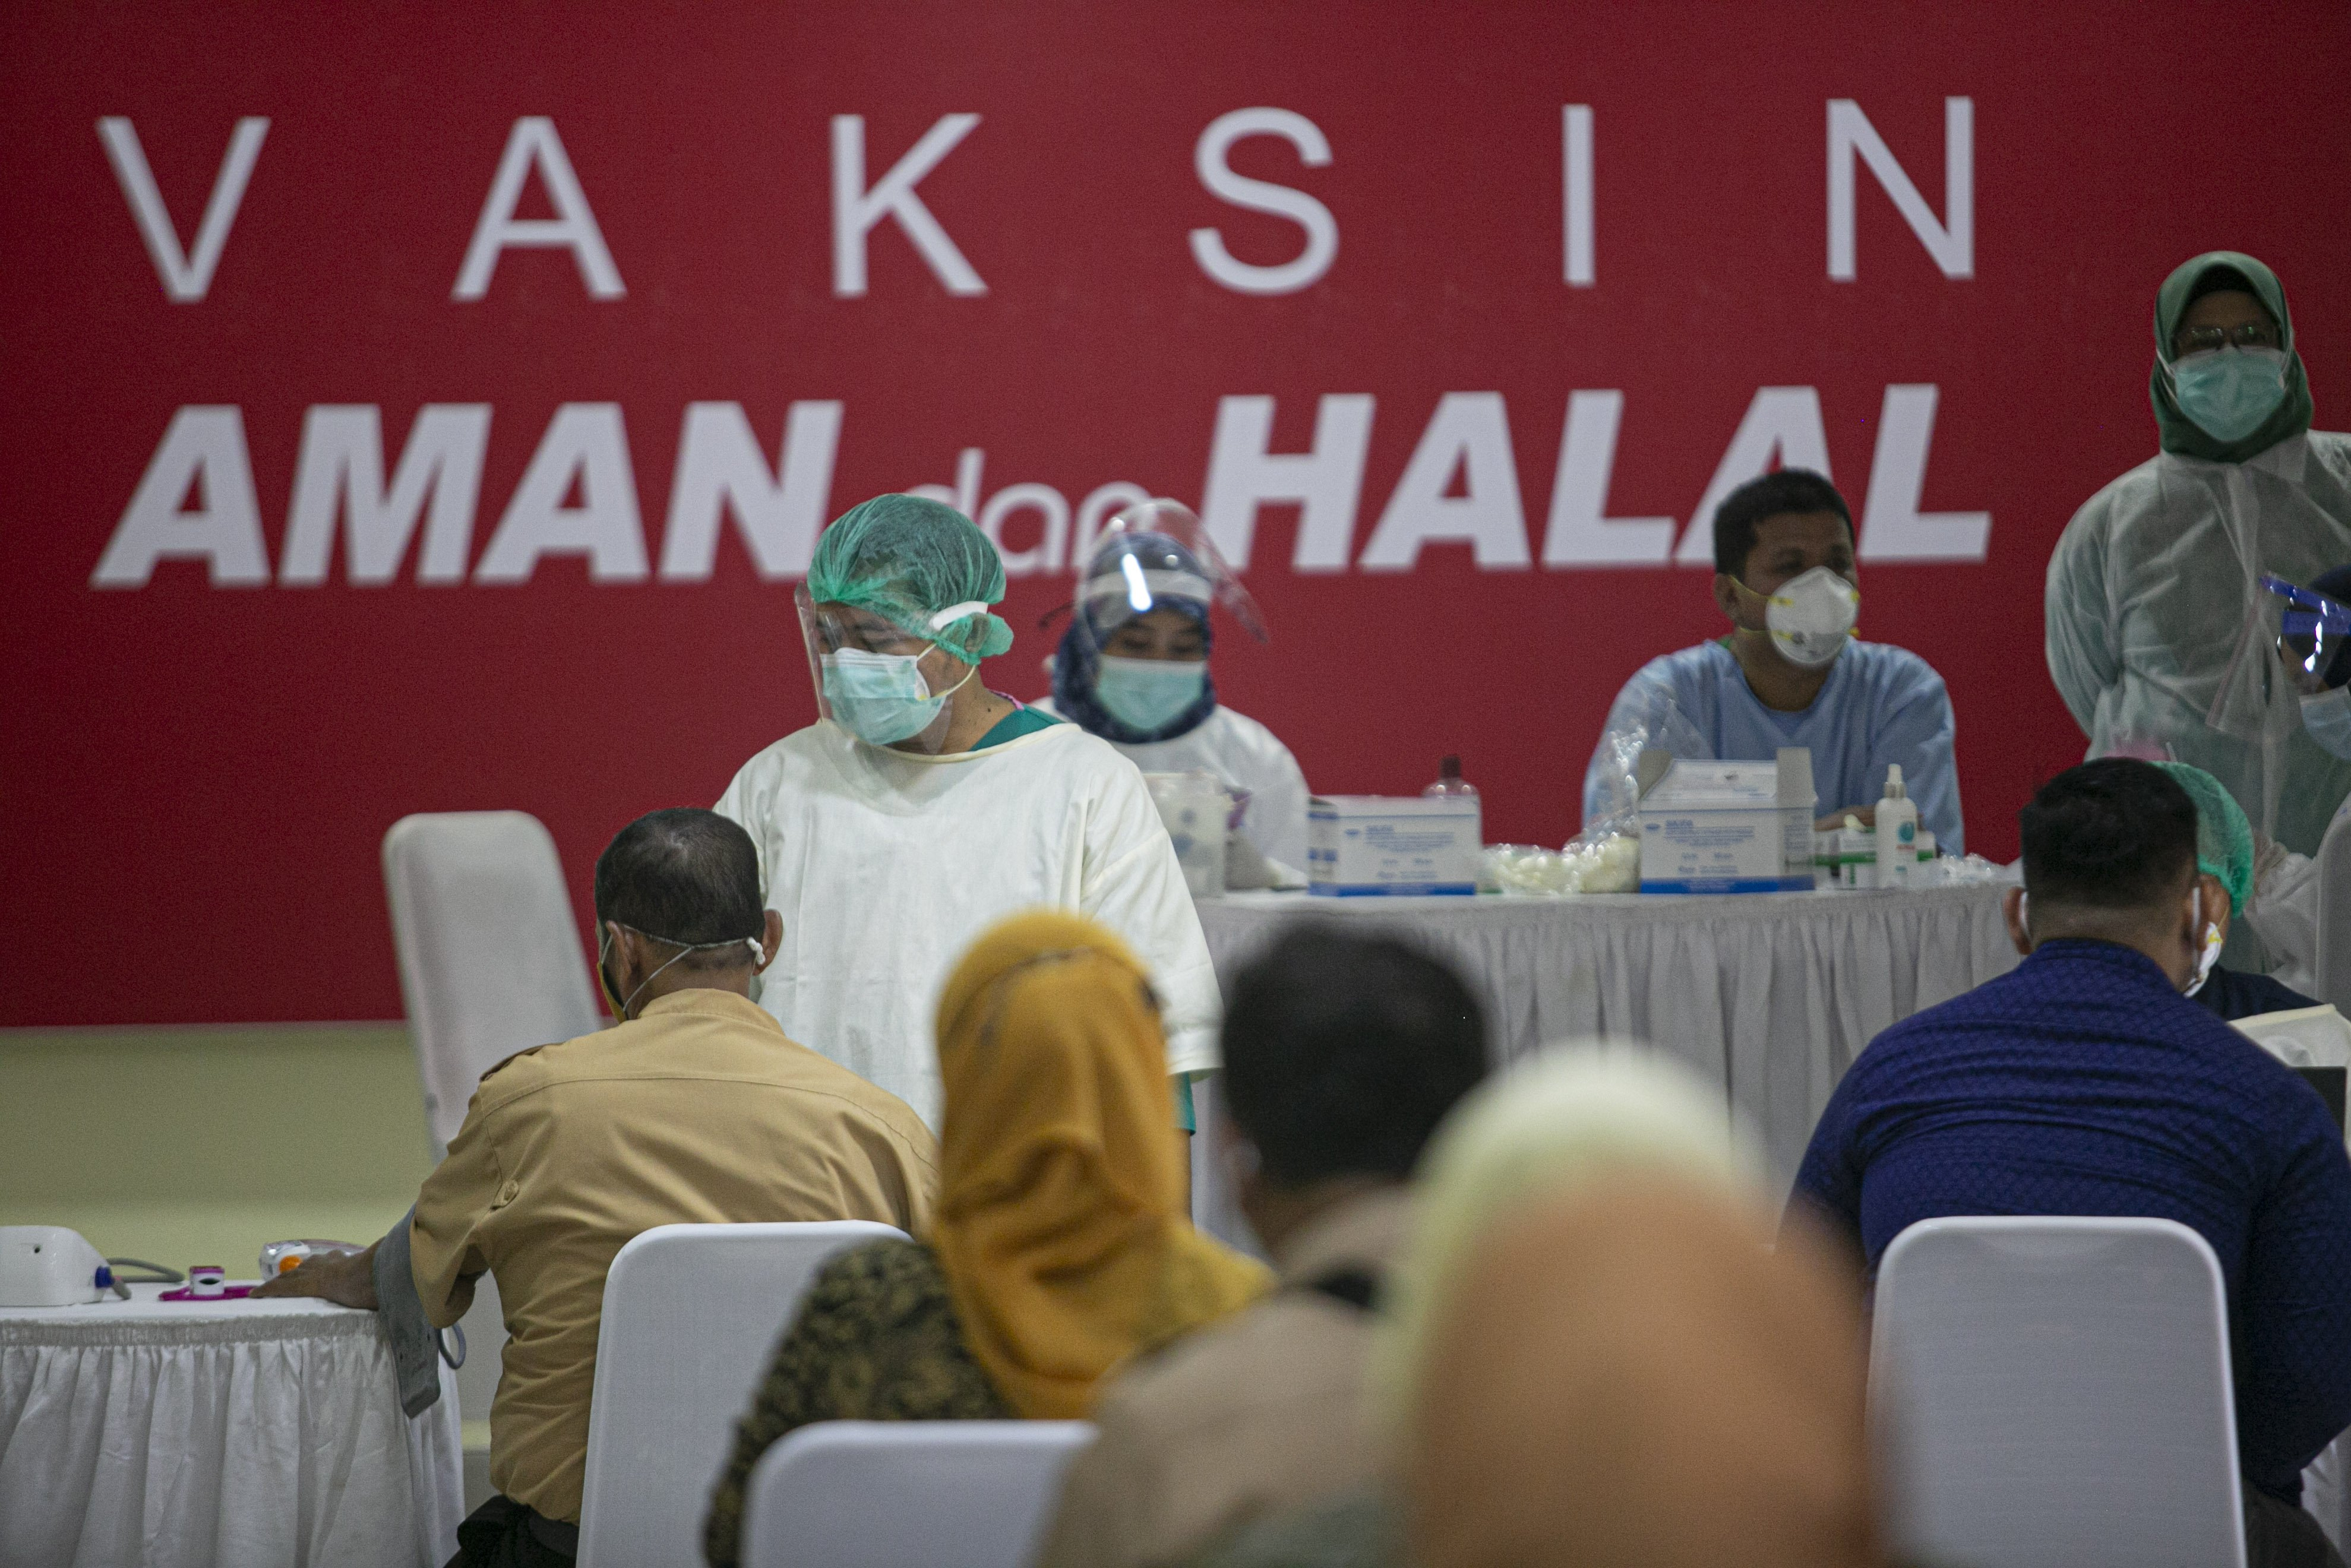 Petugas melakukan pemeriksaan awal kepada tenaga pendidik sebelum vaksinasi COVID-19 di SMA Negeri 70 Jakarta, Jakarta, Rabu (24/2/2021). Pemerintah memulai tahap vaksinasi untuk guru, tenaga kependidikan, dan dosen dengan target sebanyak 5.057.582 orang se-Indonesia.